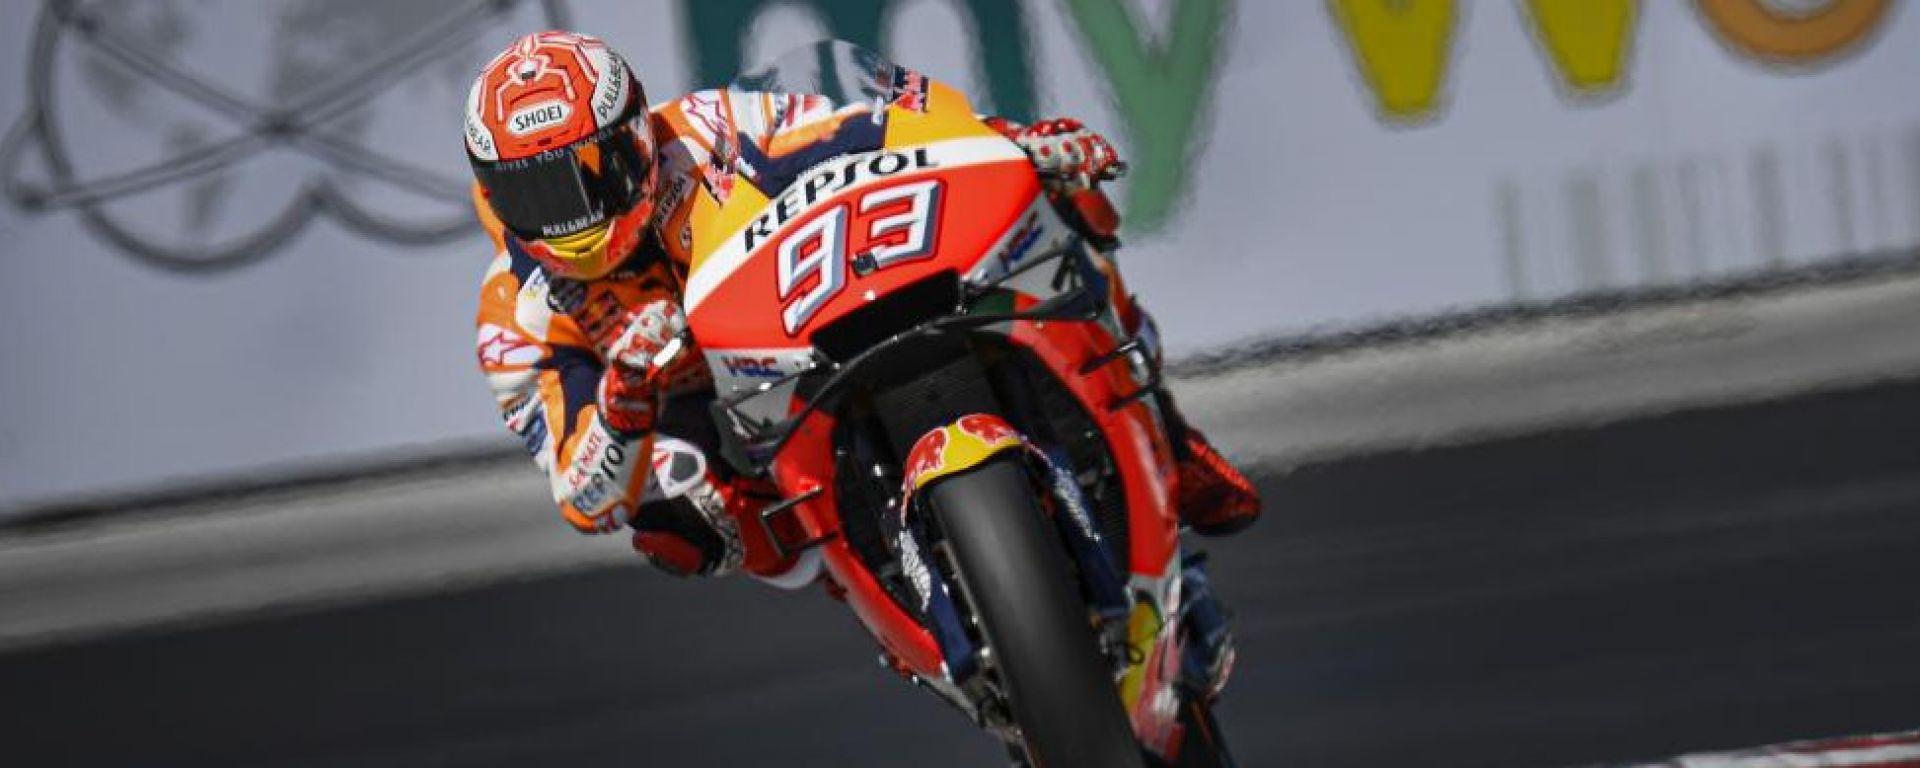 "MotoGP Austria 2019, Marquez: ""Contento, ma la gara è lunga"""